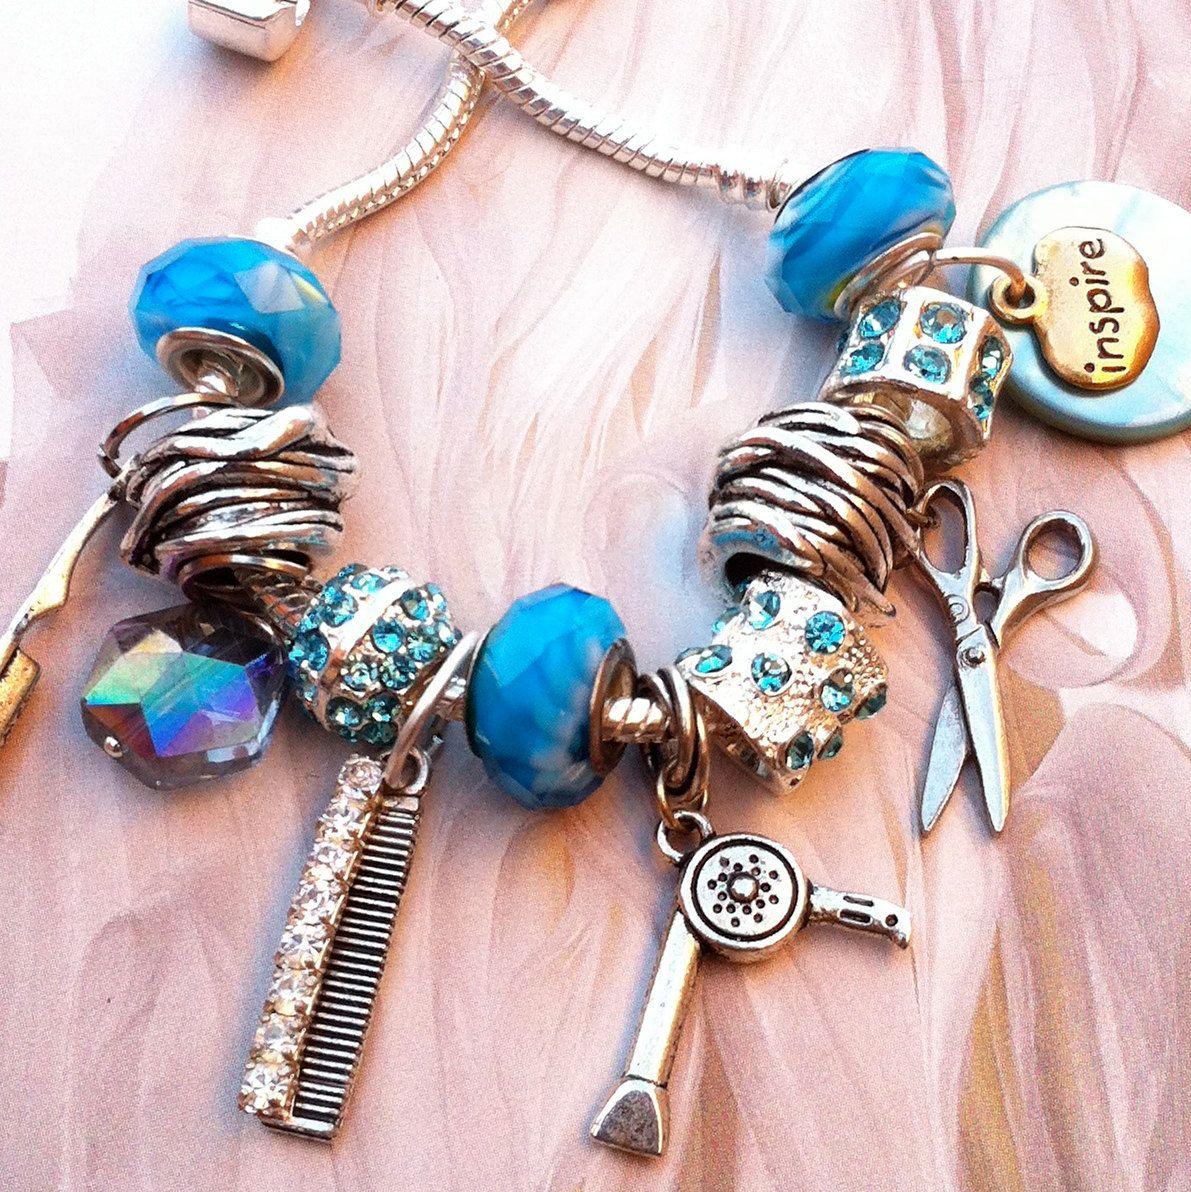 Hairstylist Style  Hairstylist Hair Artist Funky Pandora Style Charm  Braceletsilverblue